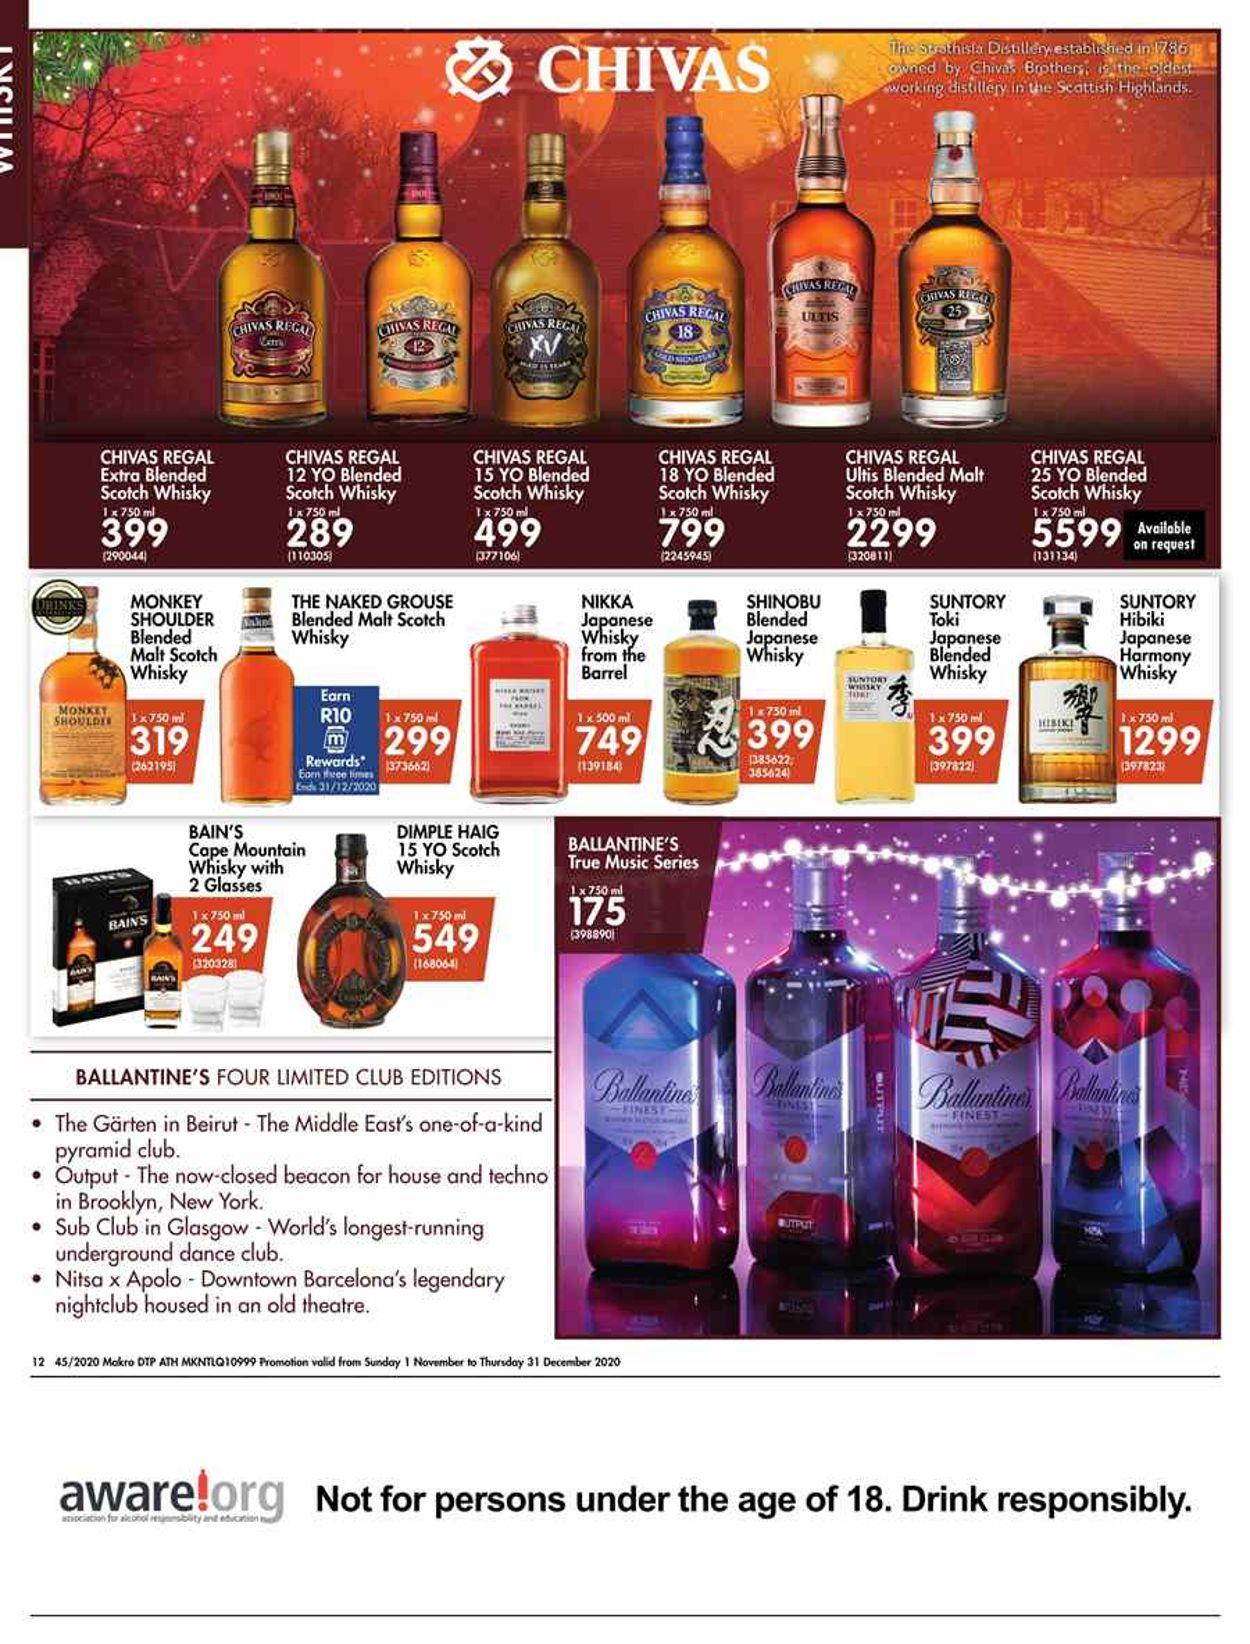 Makro Holidays 2020 Catalogue - 2020/11/01-2020/12/24 (Page 12)